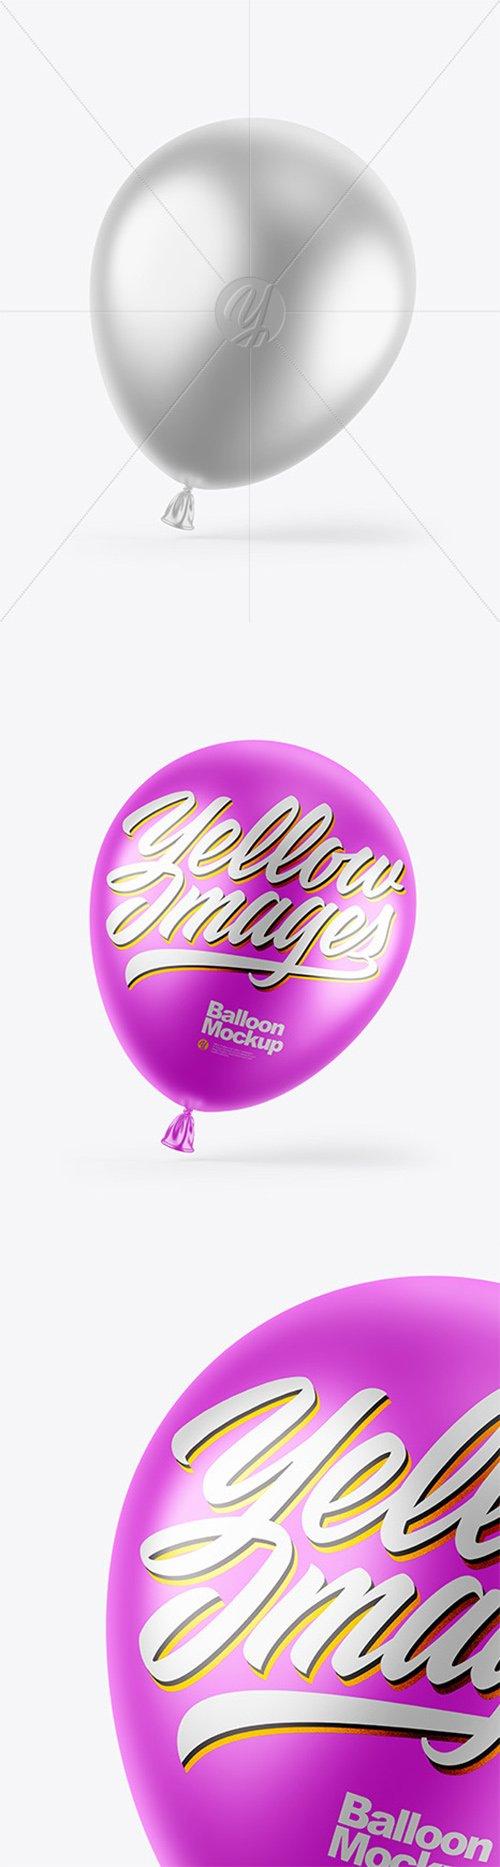 Metallic Balloon Mockup 62263